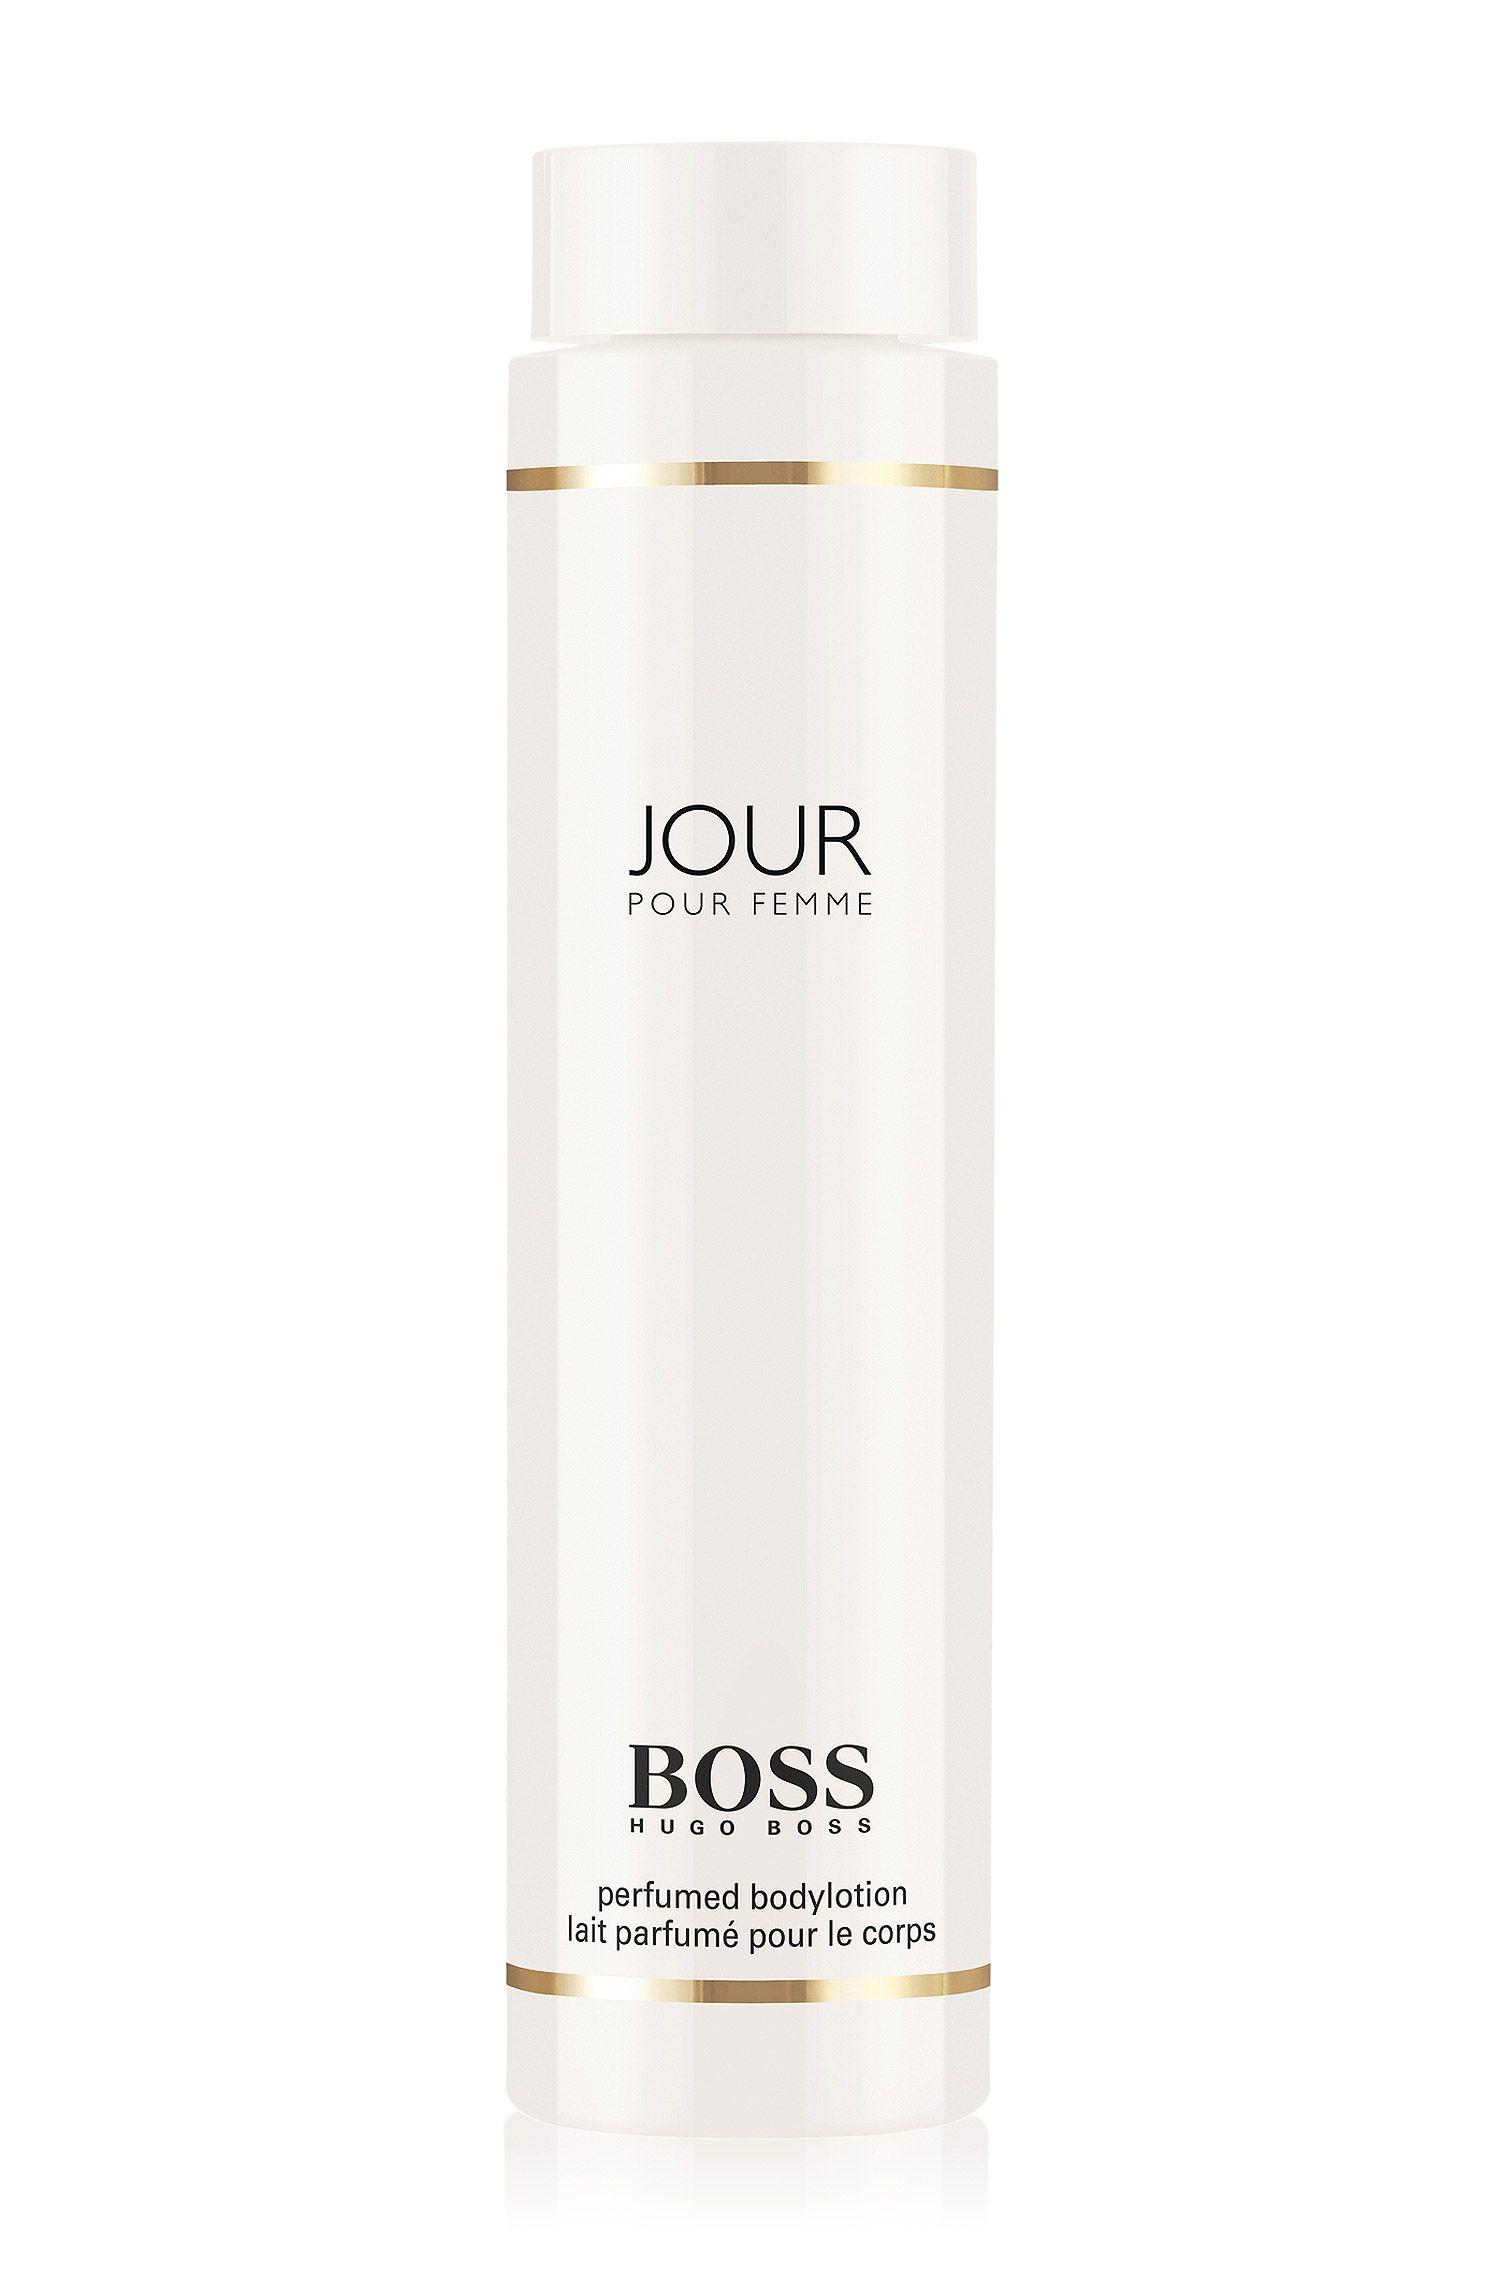 BOSS Jour Body Lotion 200 ml